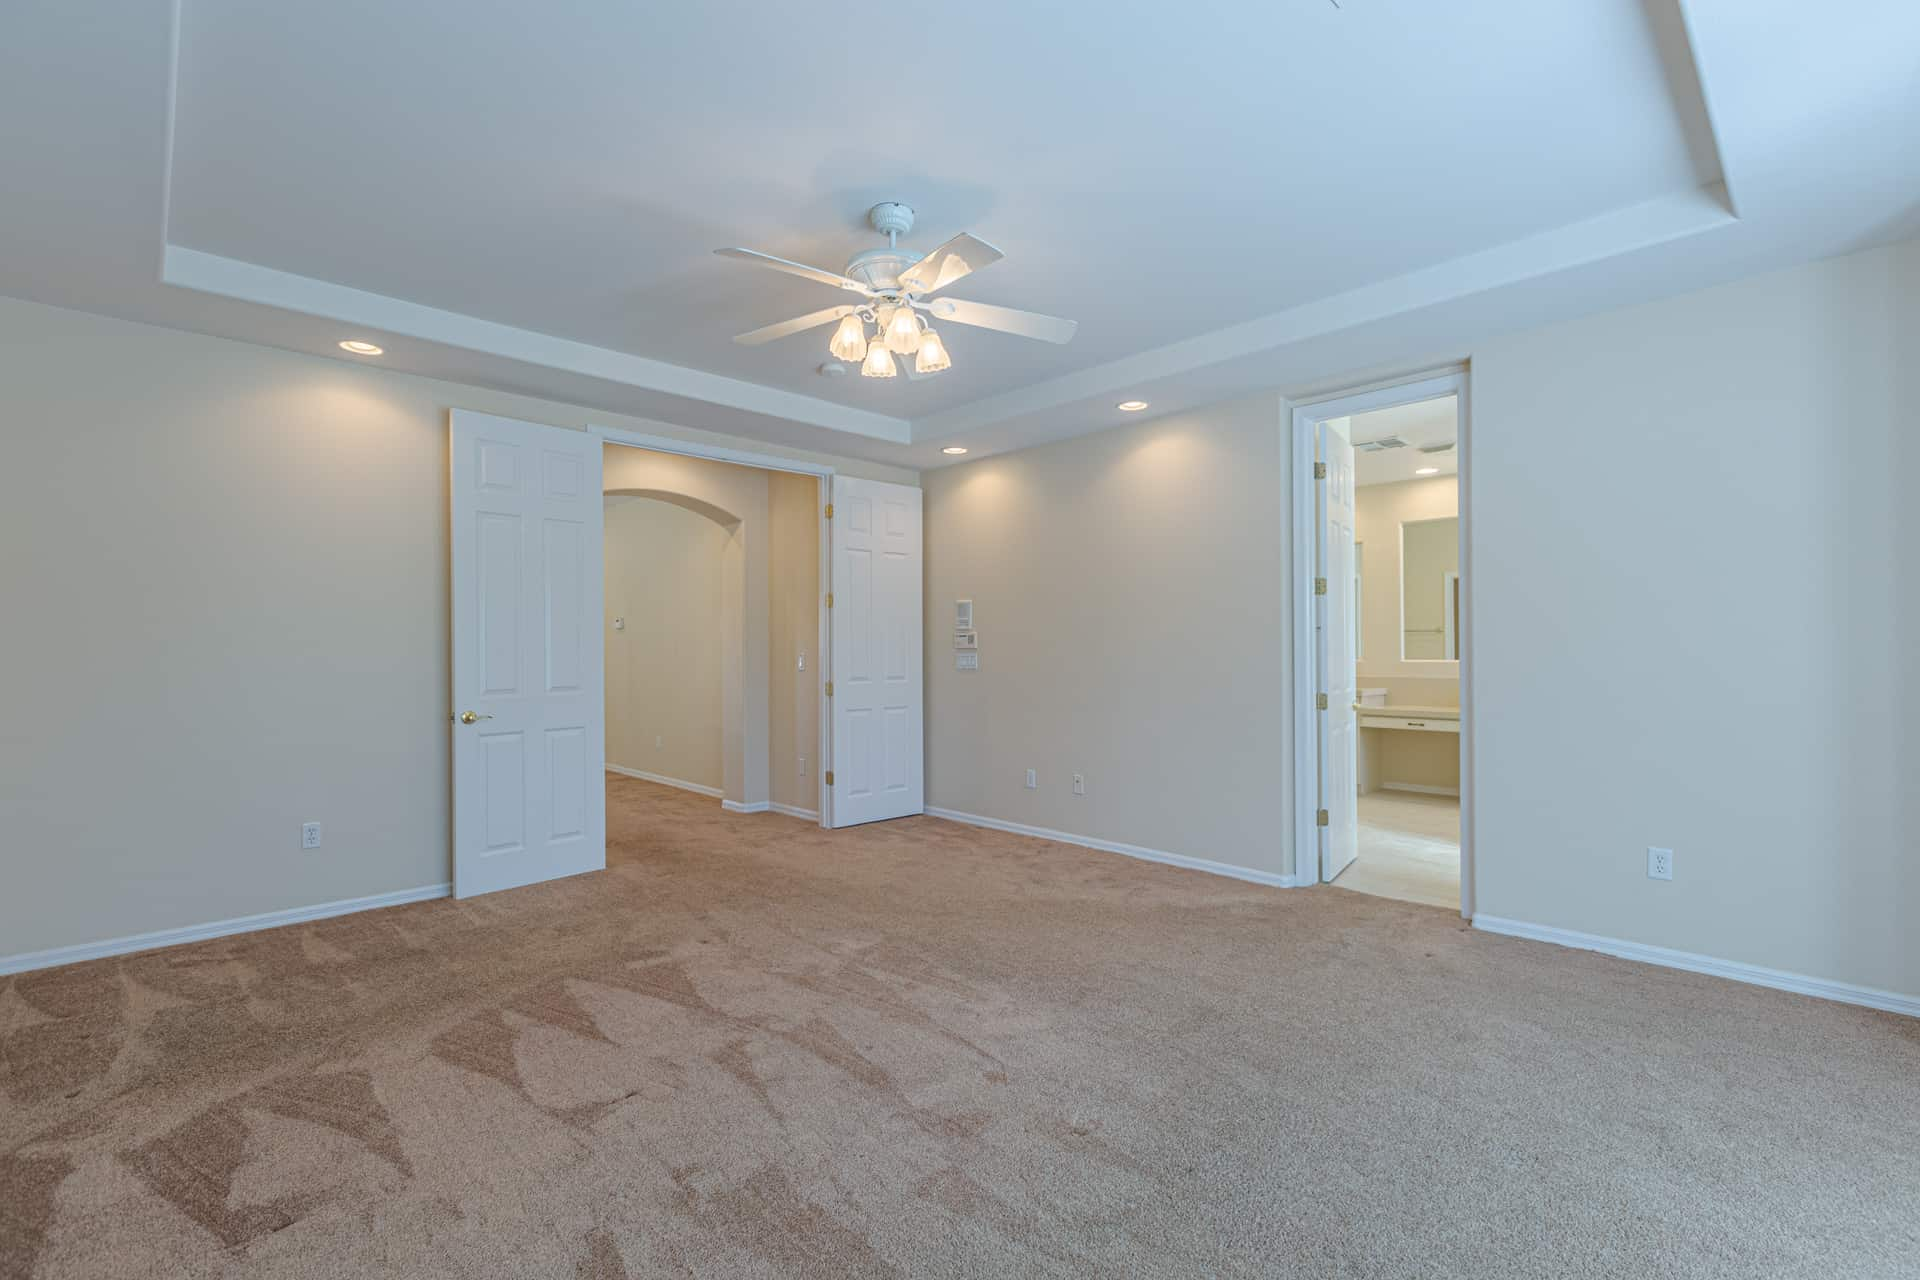 las-vegas-luxry-real-estate-realtor-rob-jensen-company-10729-grey-havens-court-willow-creek3357